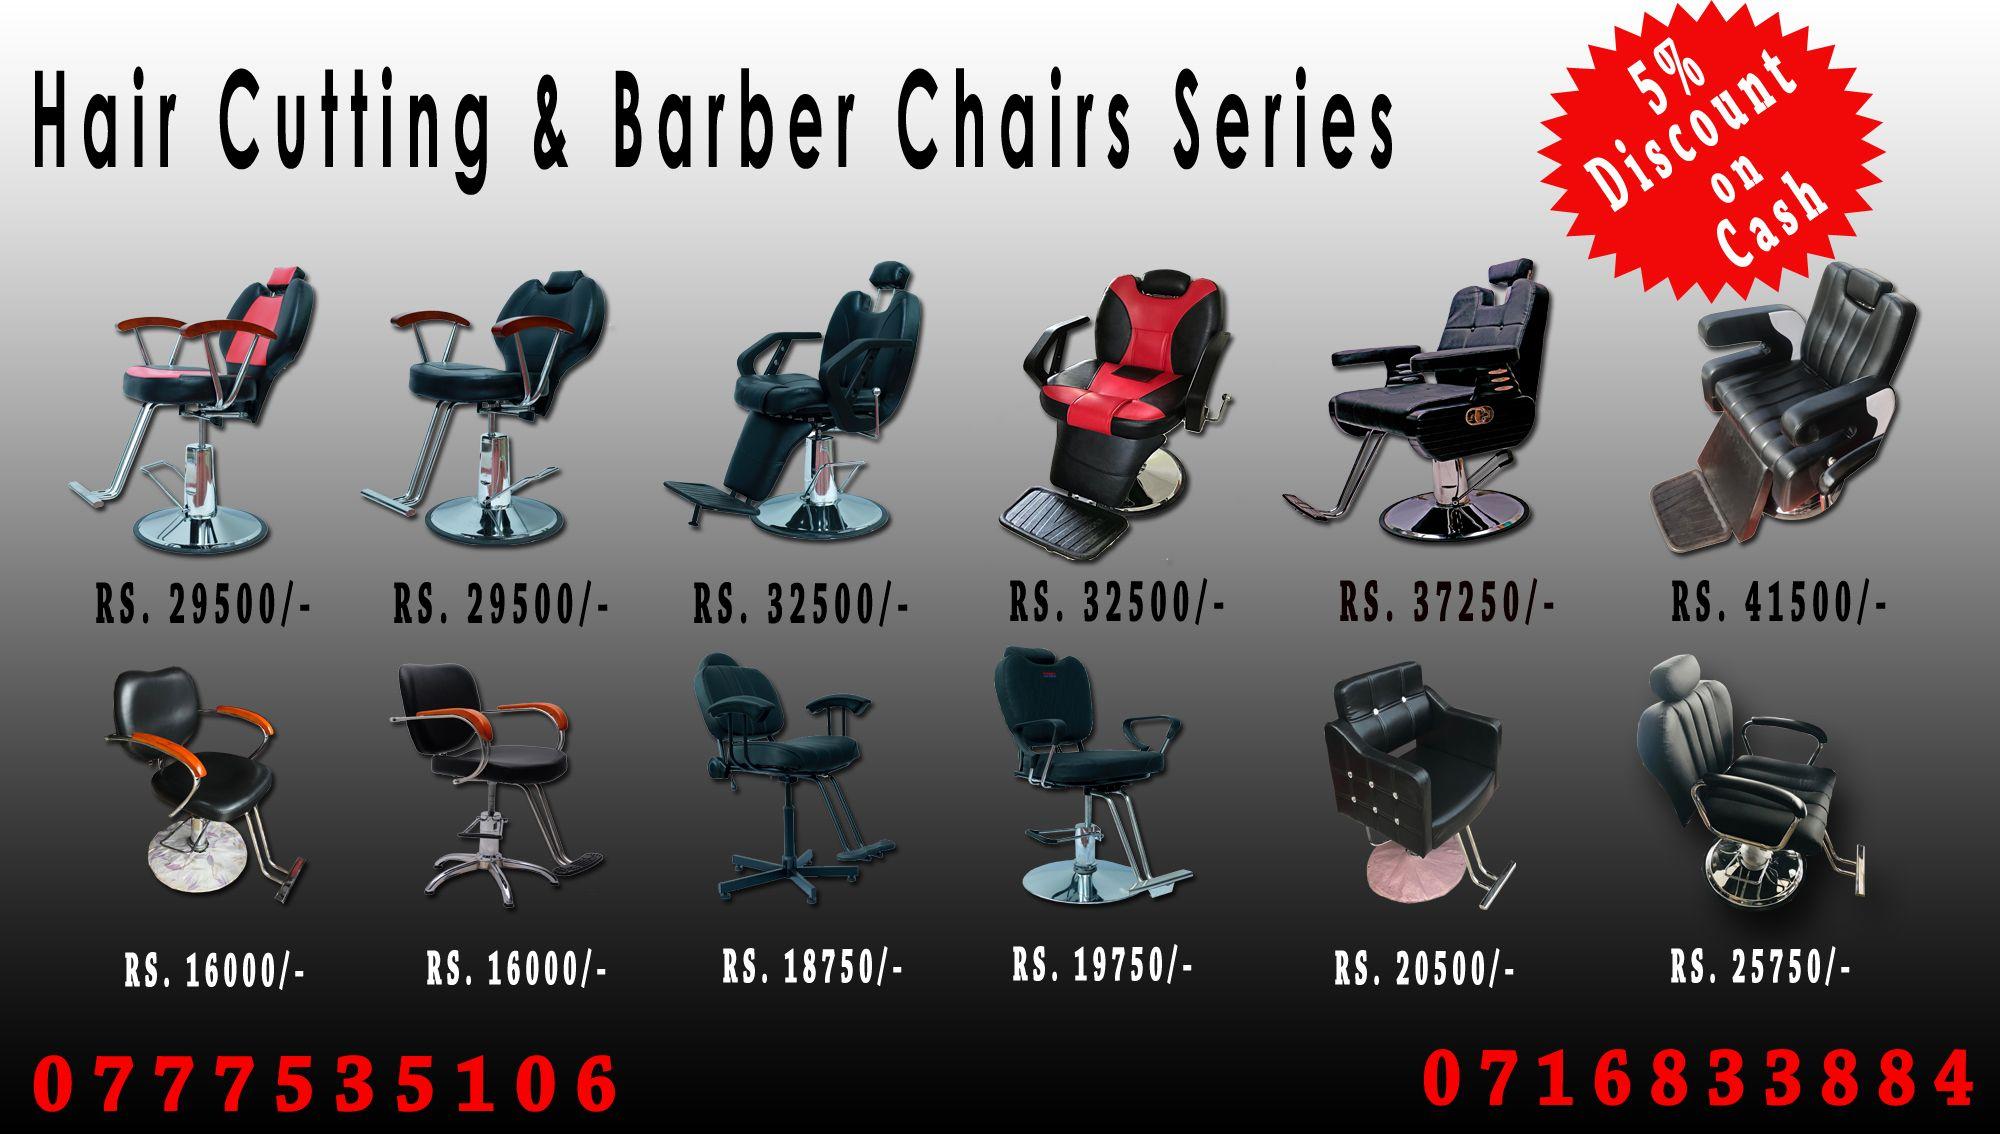 Salon / Barber Chair Series  Barber chair, Salon chairs, Barber